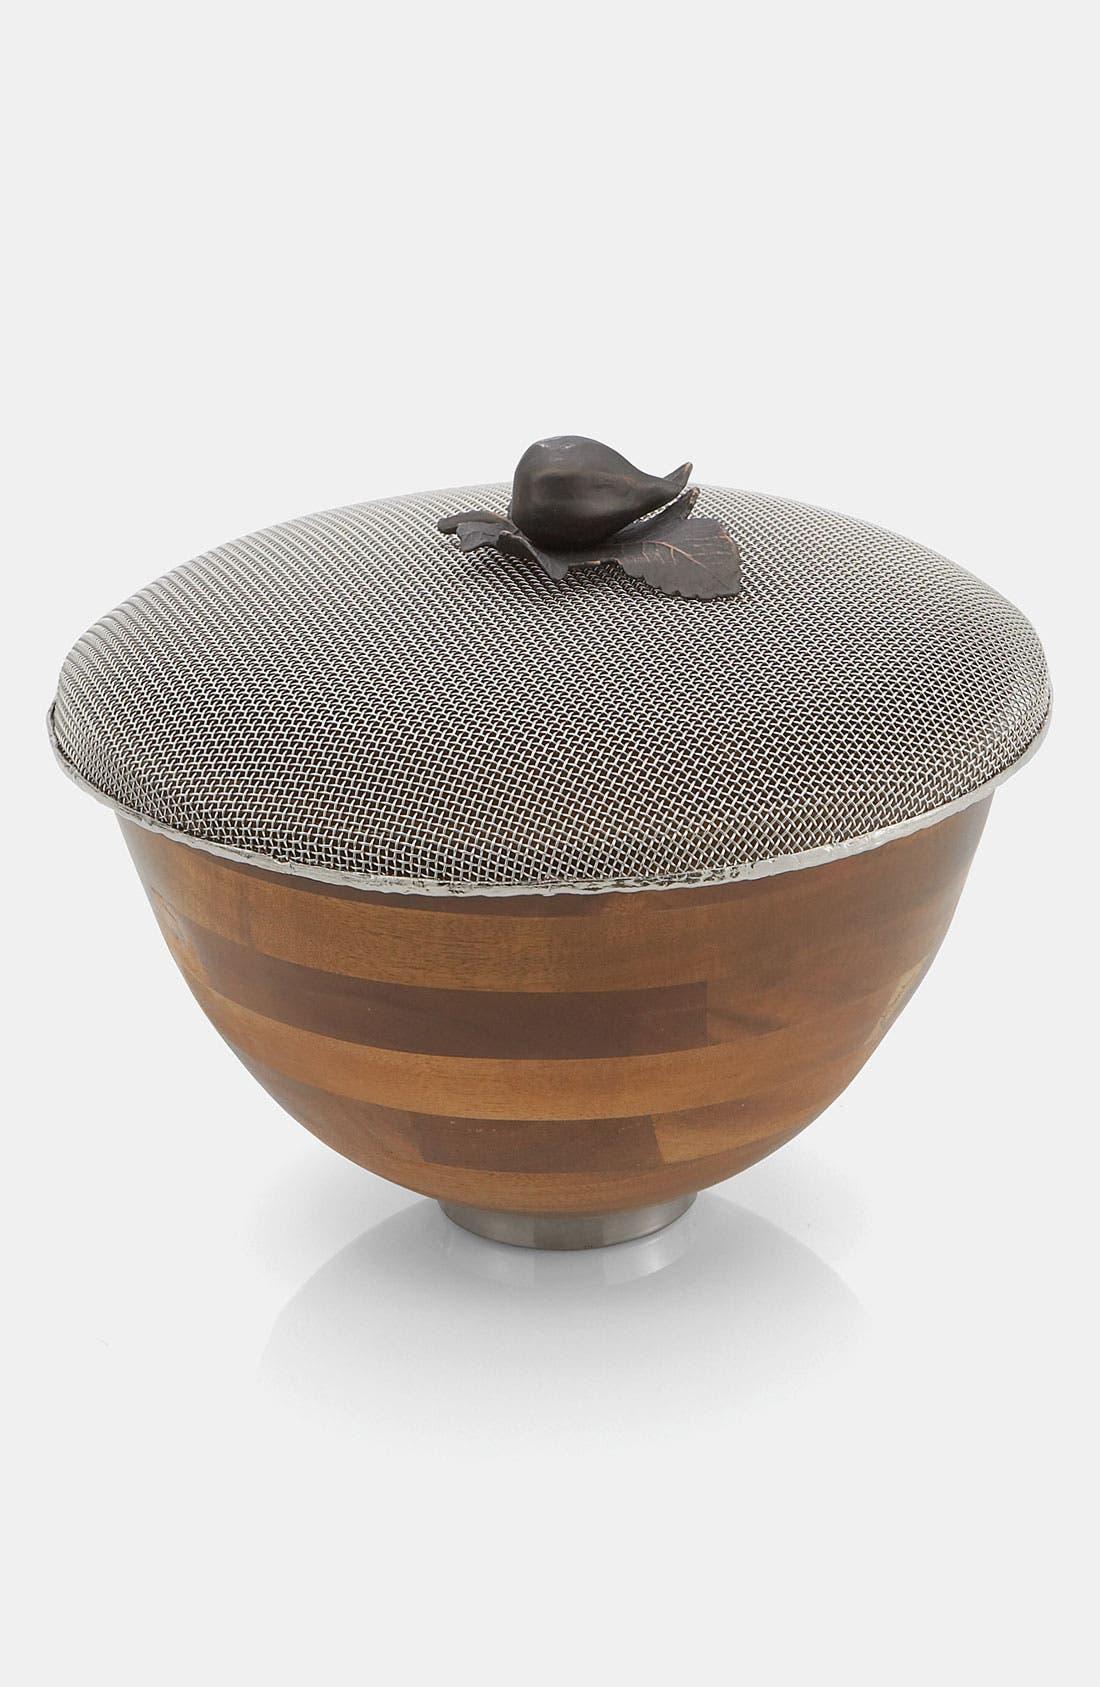 Main Image - Michael Aram 'Fig Leaf' Mesh Lid Serving Bowl